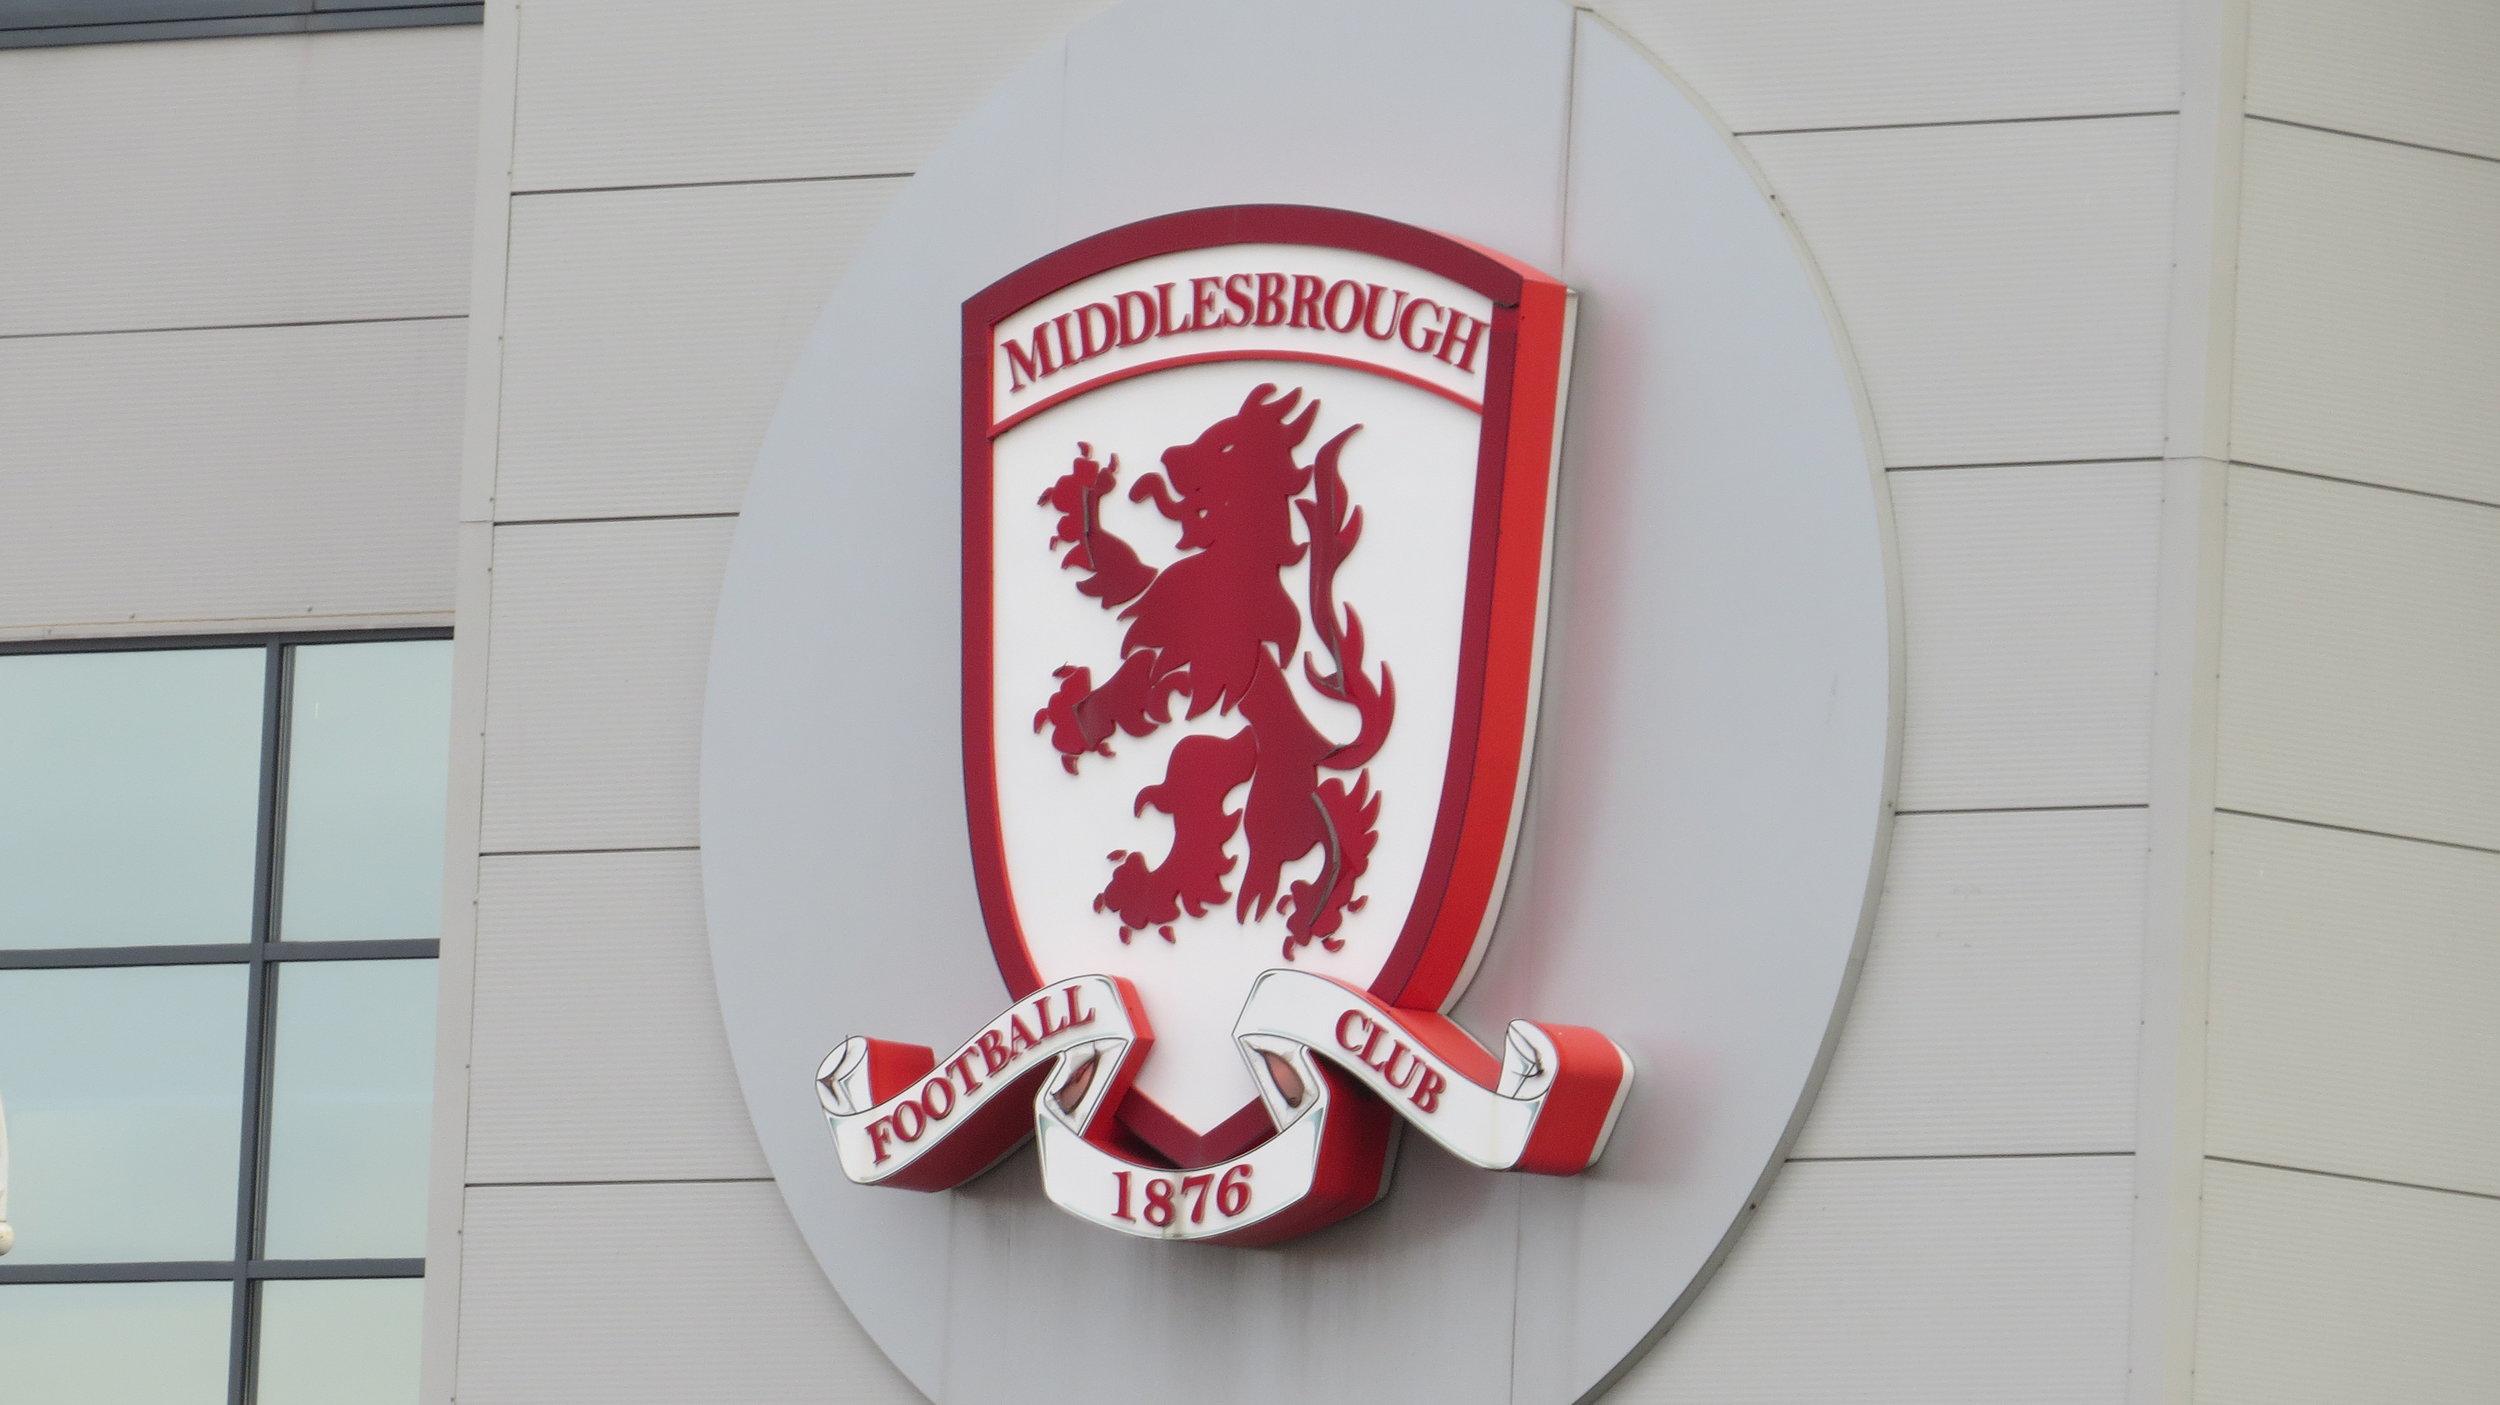 Middlesbrough Football Ground